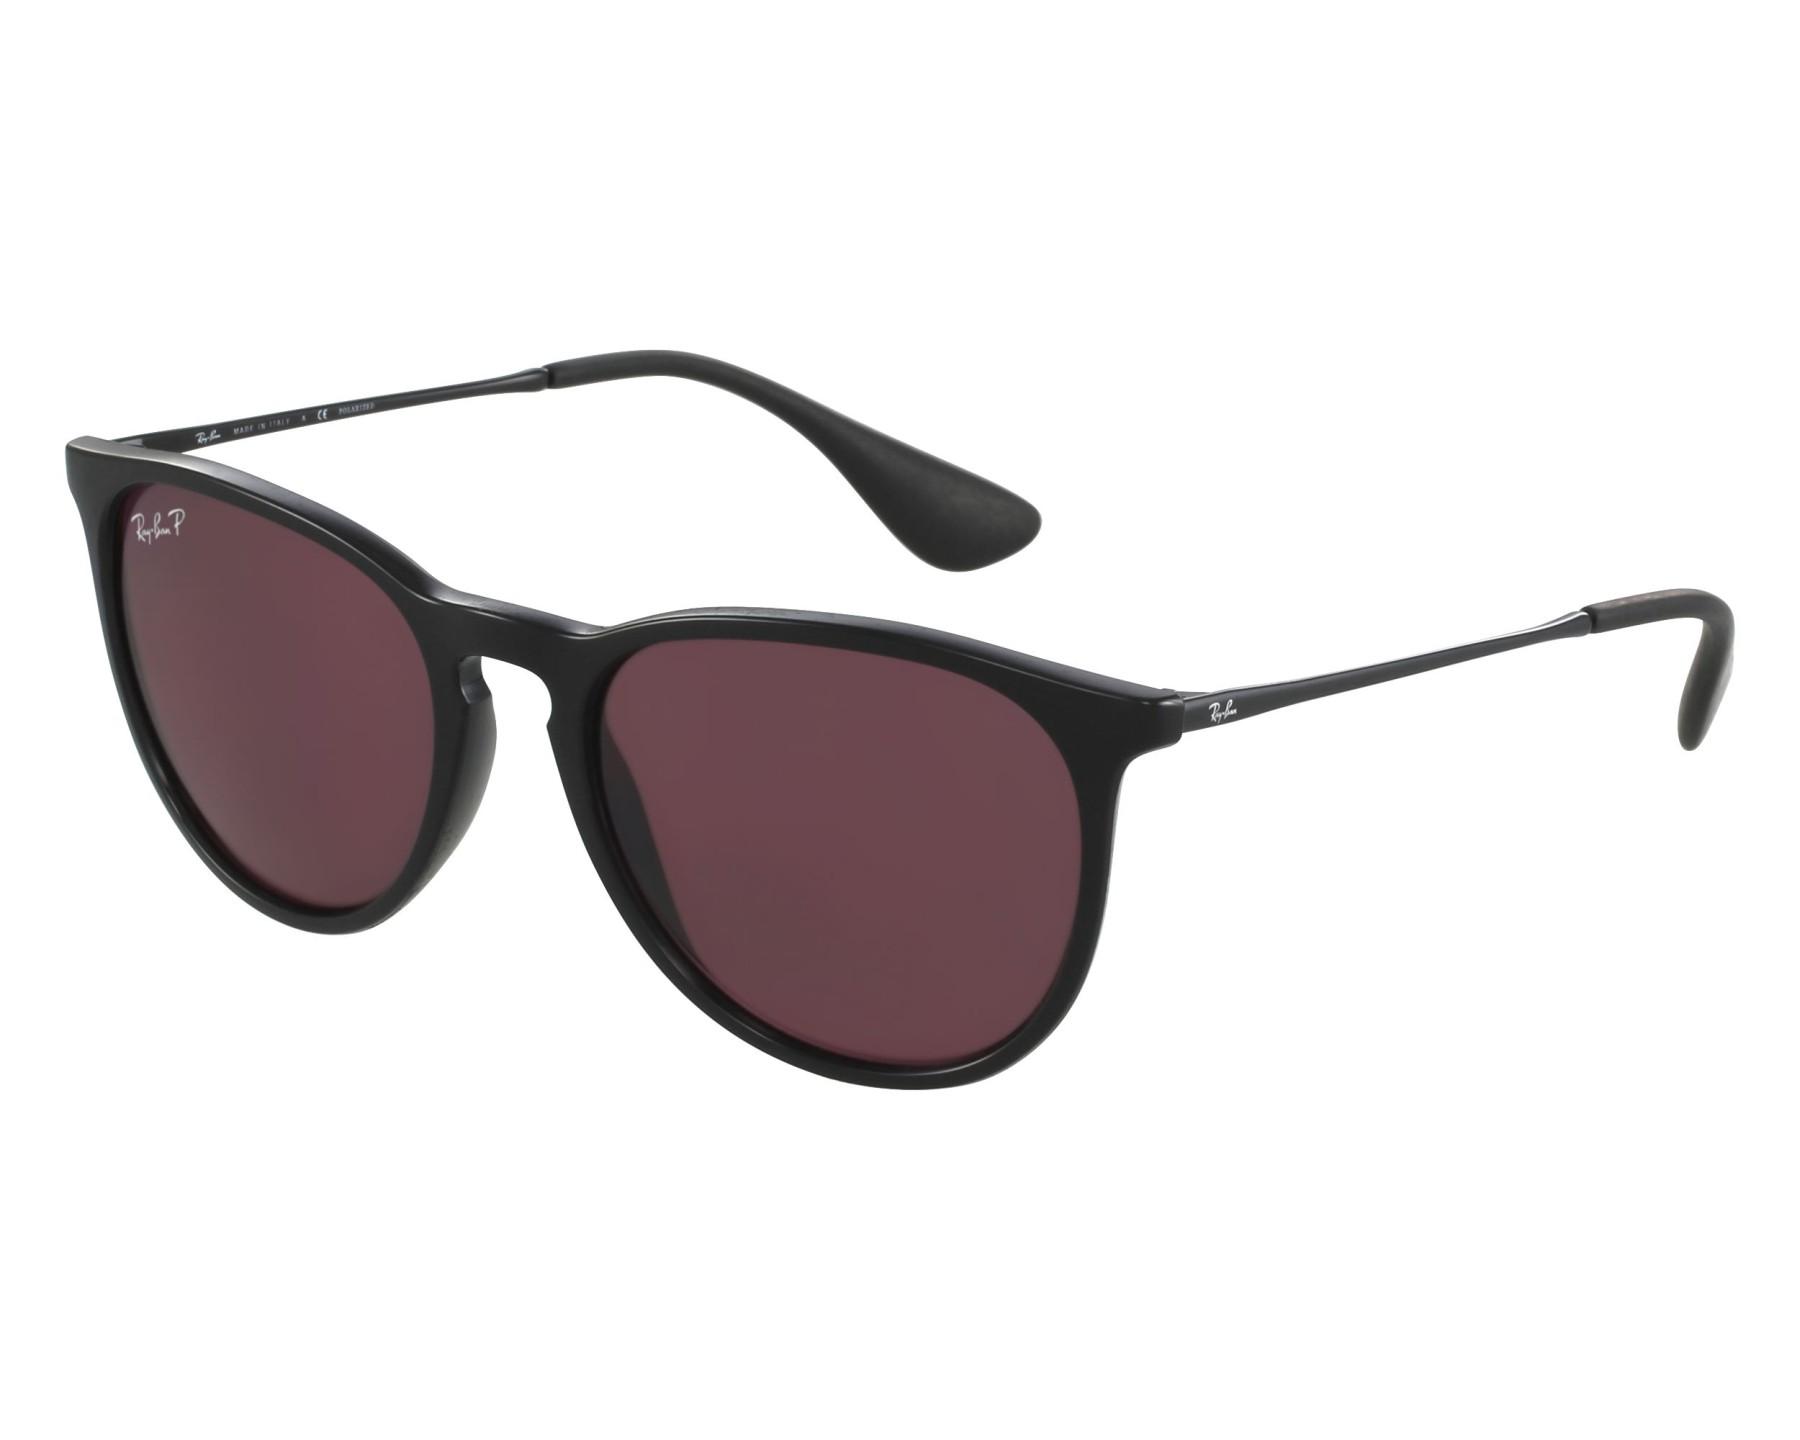 ba0ae9197eb thumbnail Sunglasses Ray-Ban RB-4171 601 5Q - Black front view